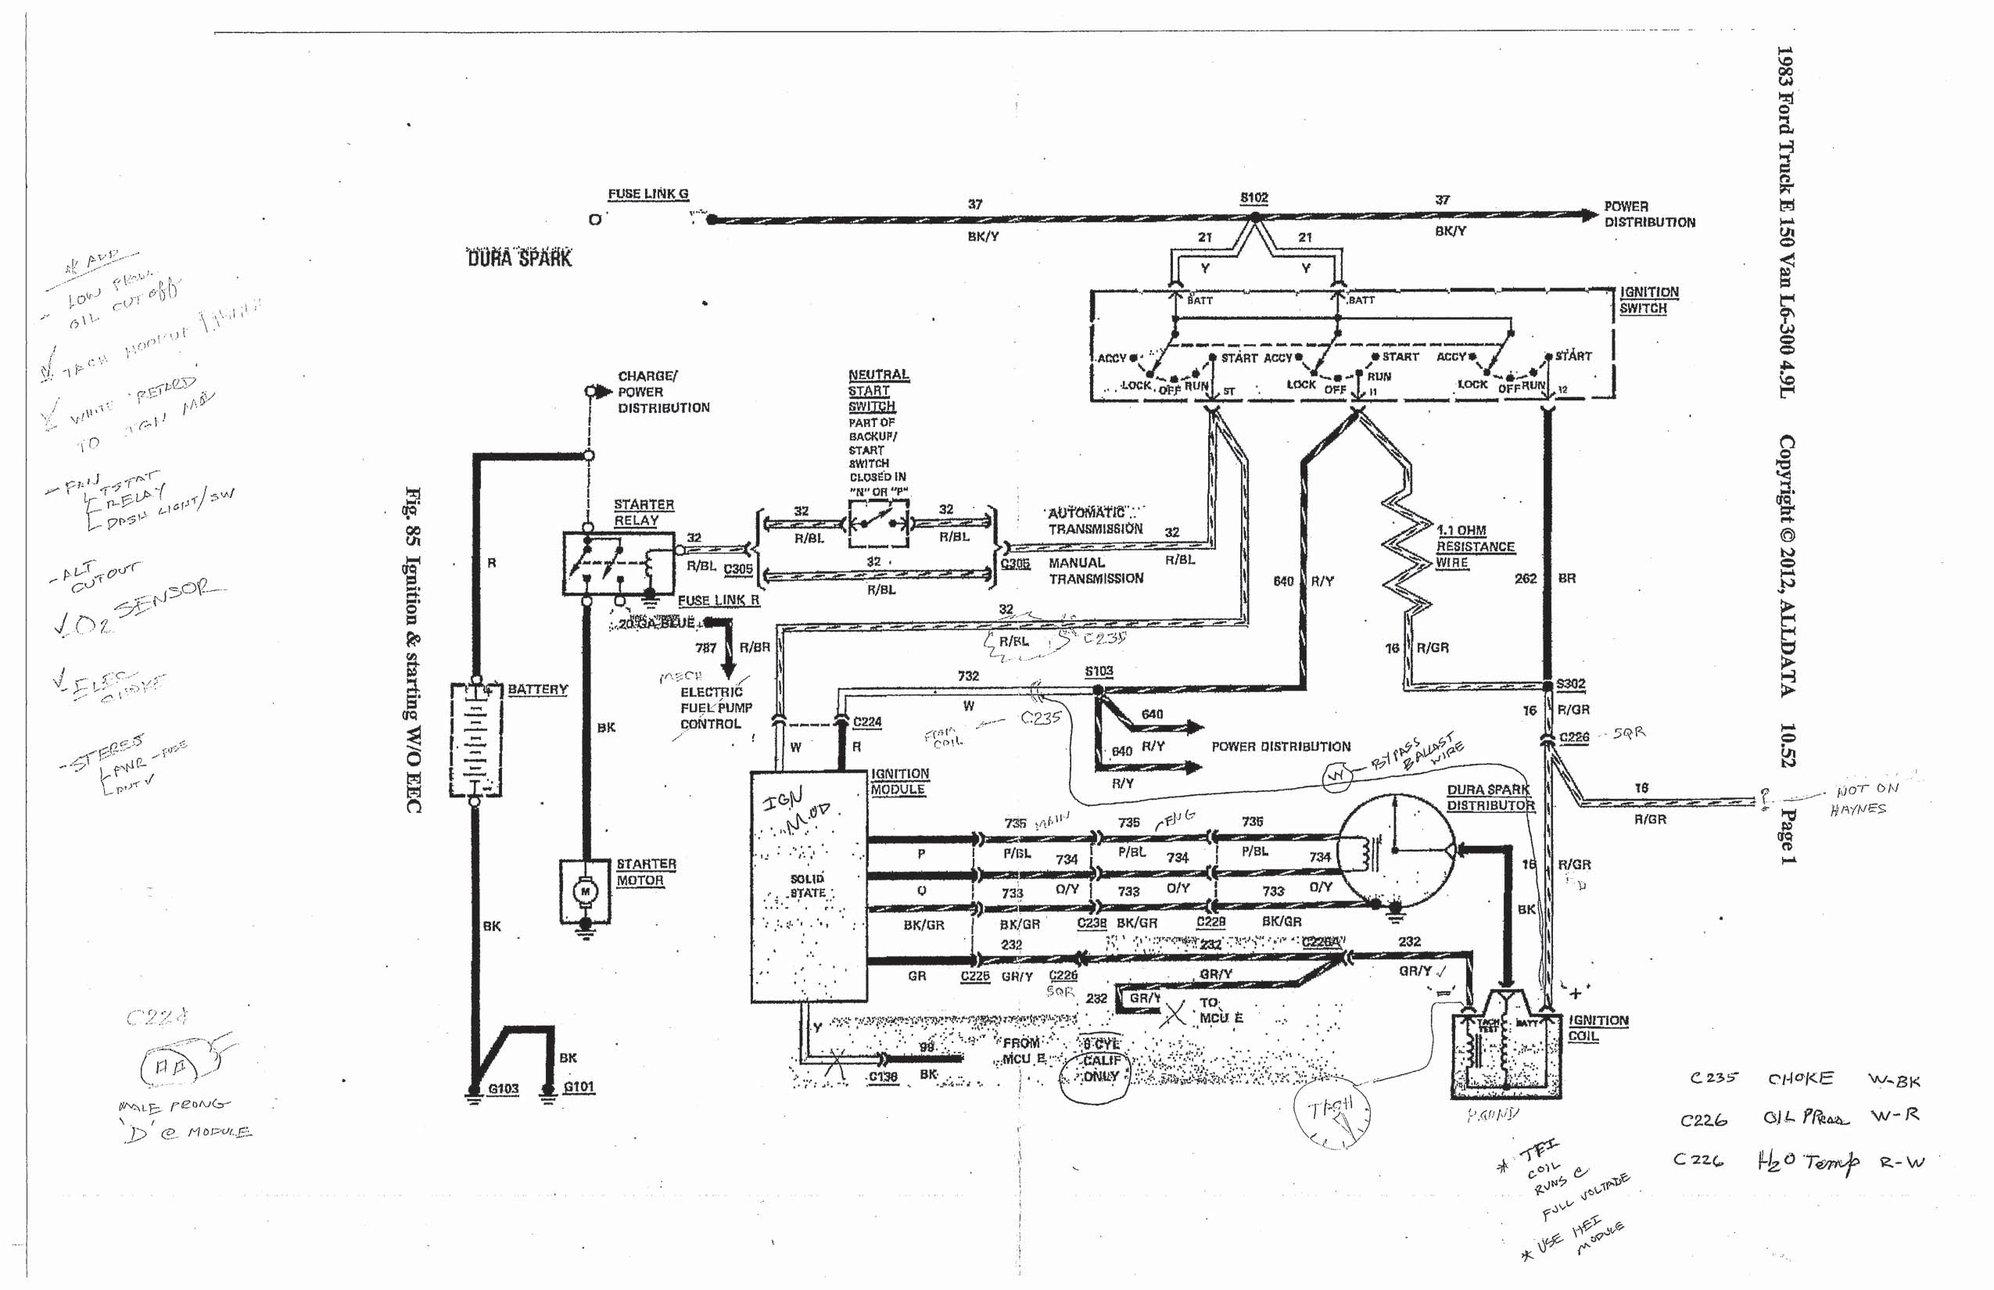 [DIAGRAM_5LK]  1986 Ford Econoline Wiring Diagram - 2000 Nissan Sentra Fuse Box Diagram  for Wiring Diagram Schematics | 1986 F150 L6 Wire Diagram |  | Wiring Diagram Schematics